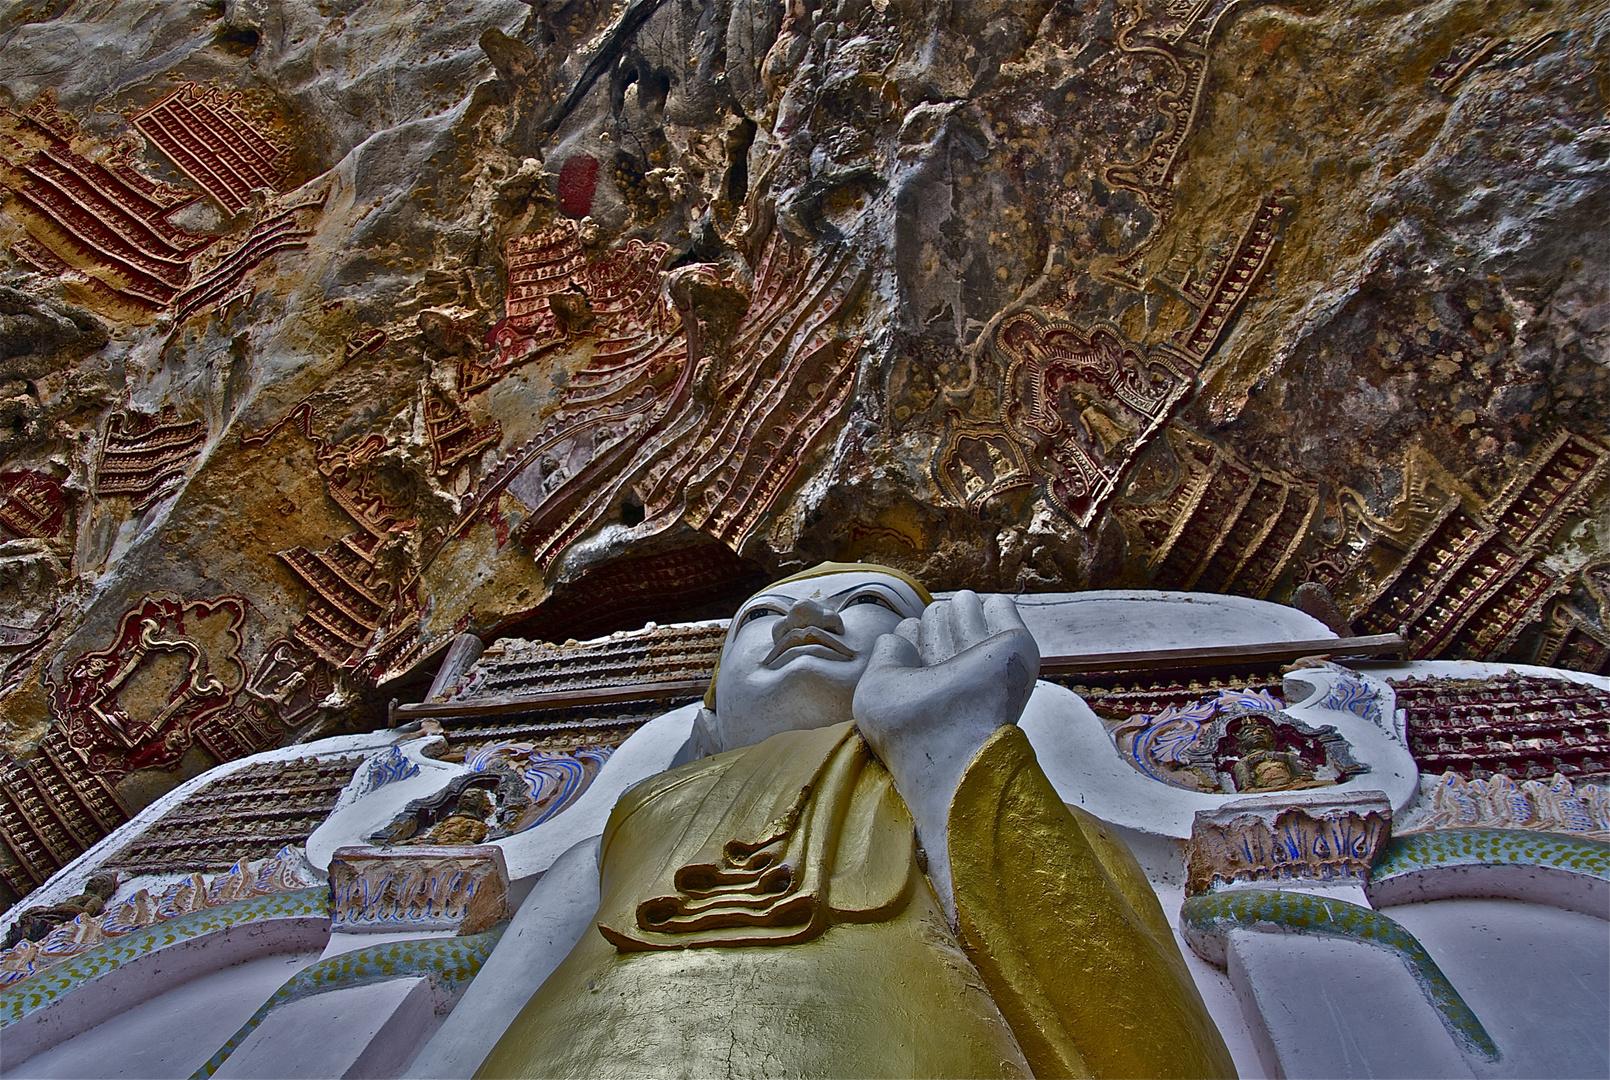 höhlenbuddha III